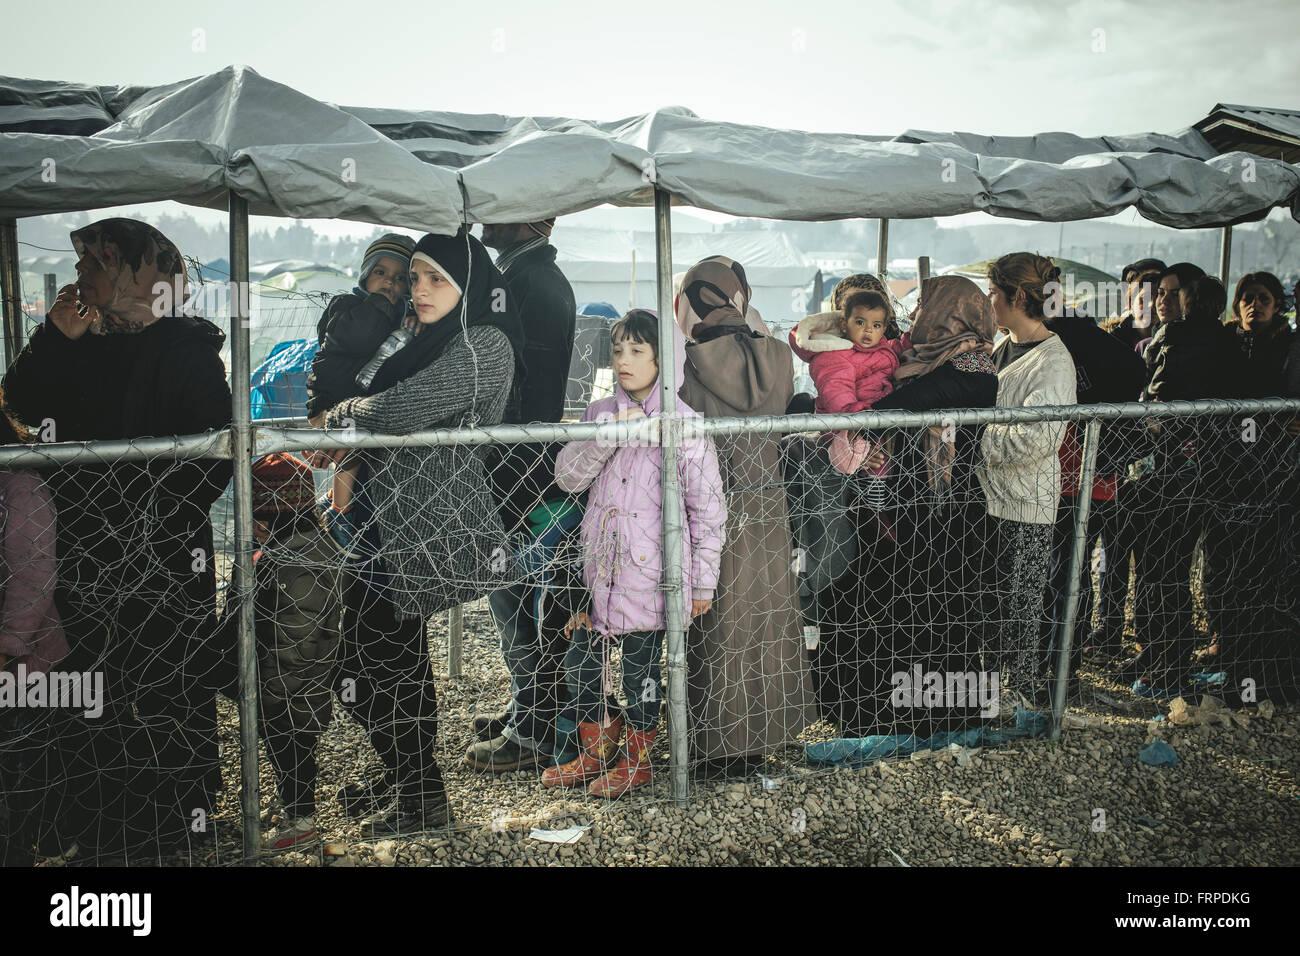 Idomeni refugee camp on the Greece Macedonia border, refugees queue for food, Idomeni, Central Macedonia, Greece - Stock Image